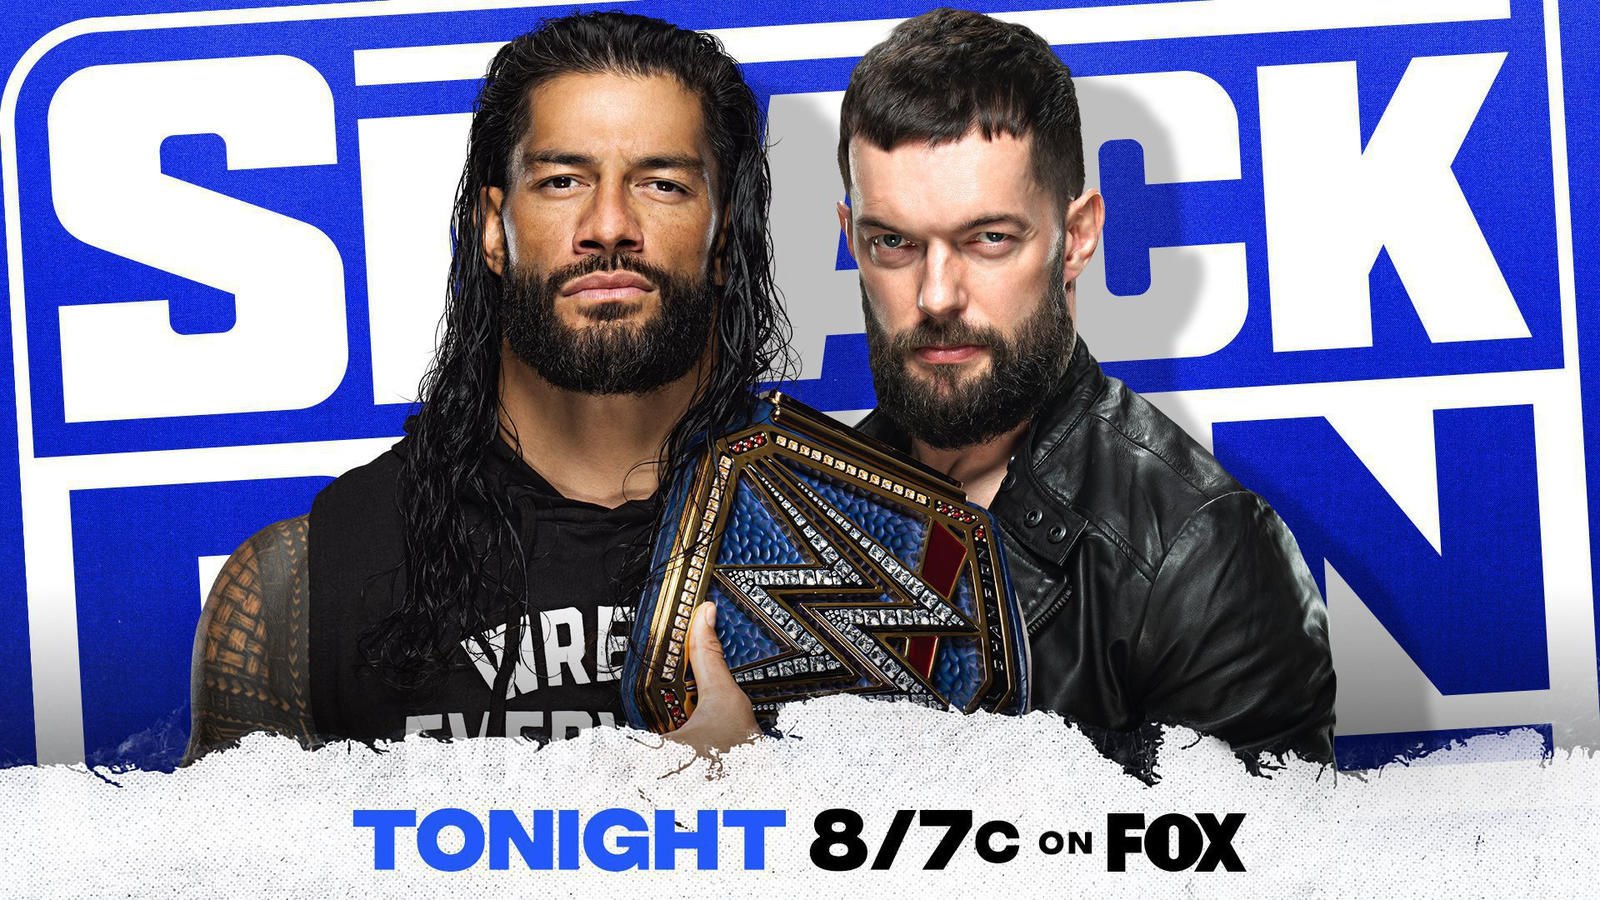 WWE SmackDown Results (7/30) - Minneapolis, MN